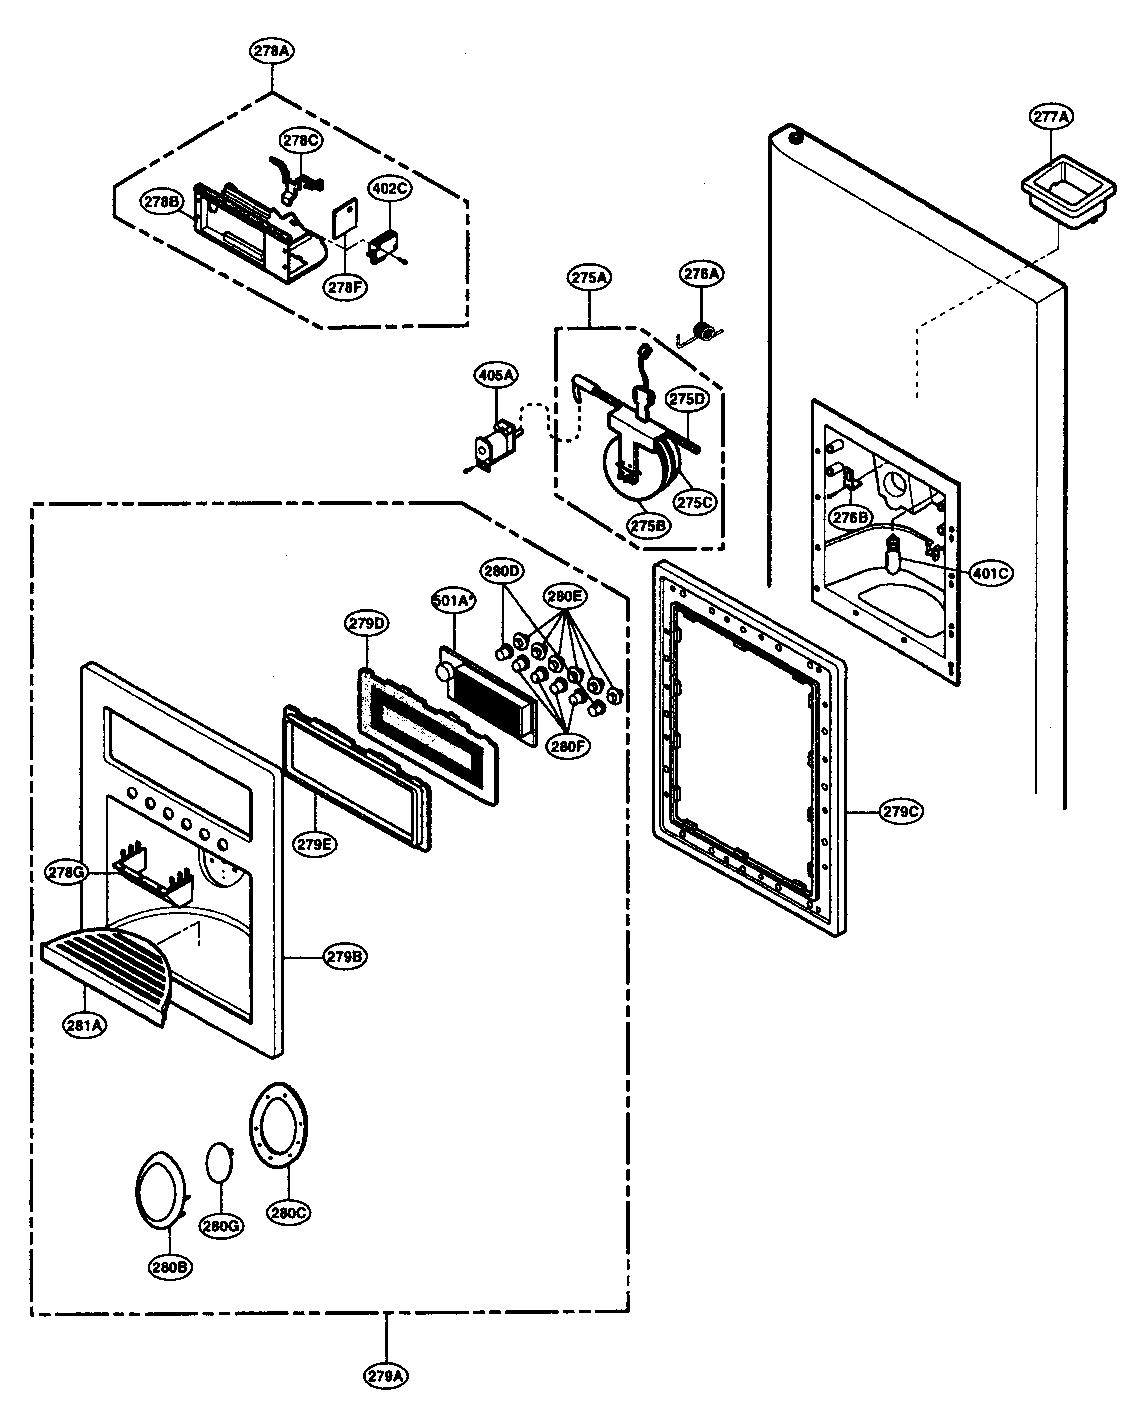 Lg model LRSC26980TT side-by-side refrigerator genuine parts